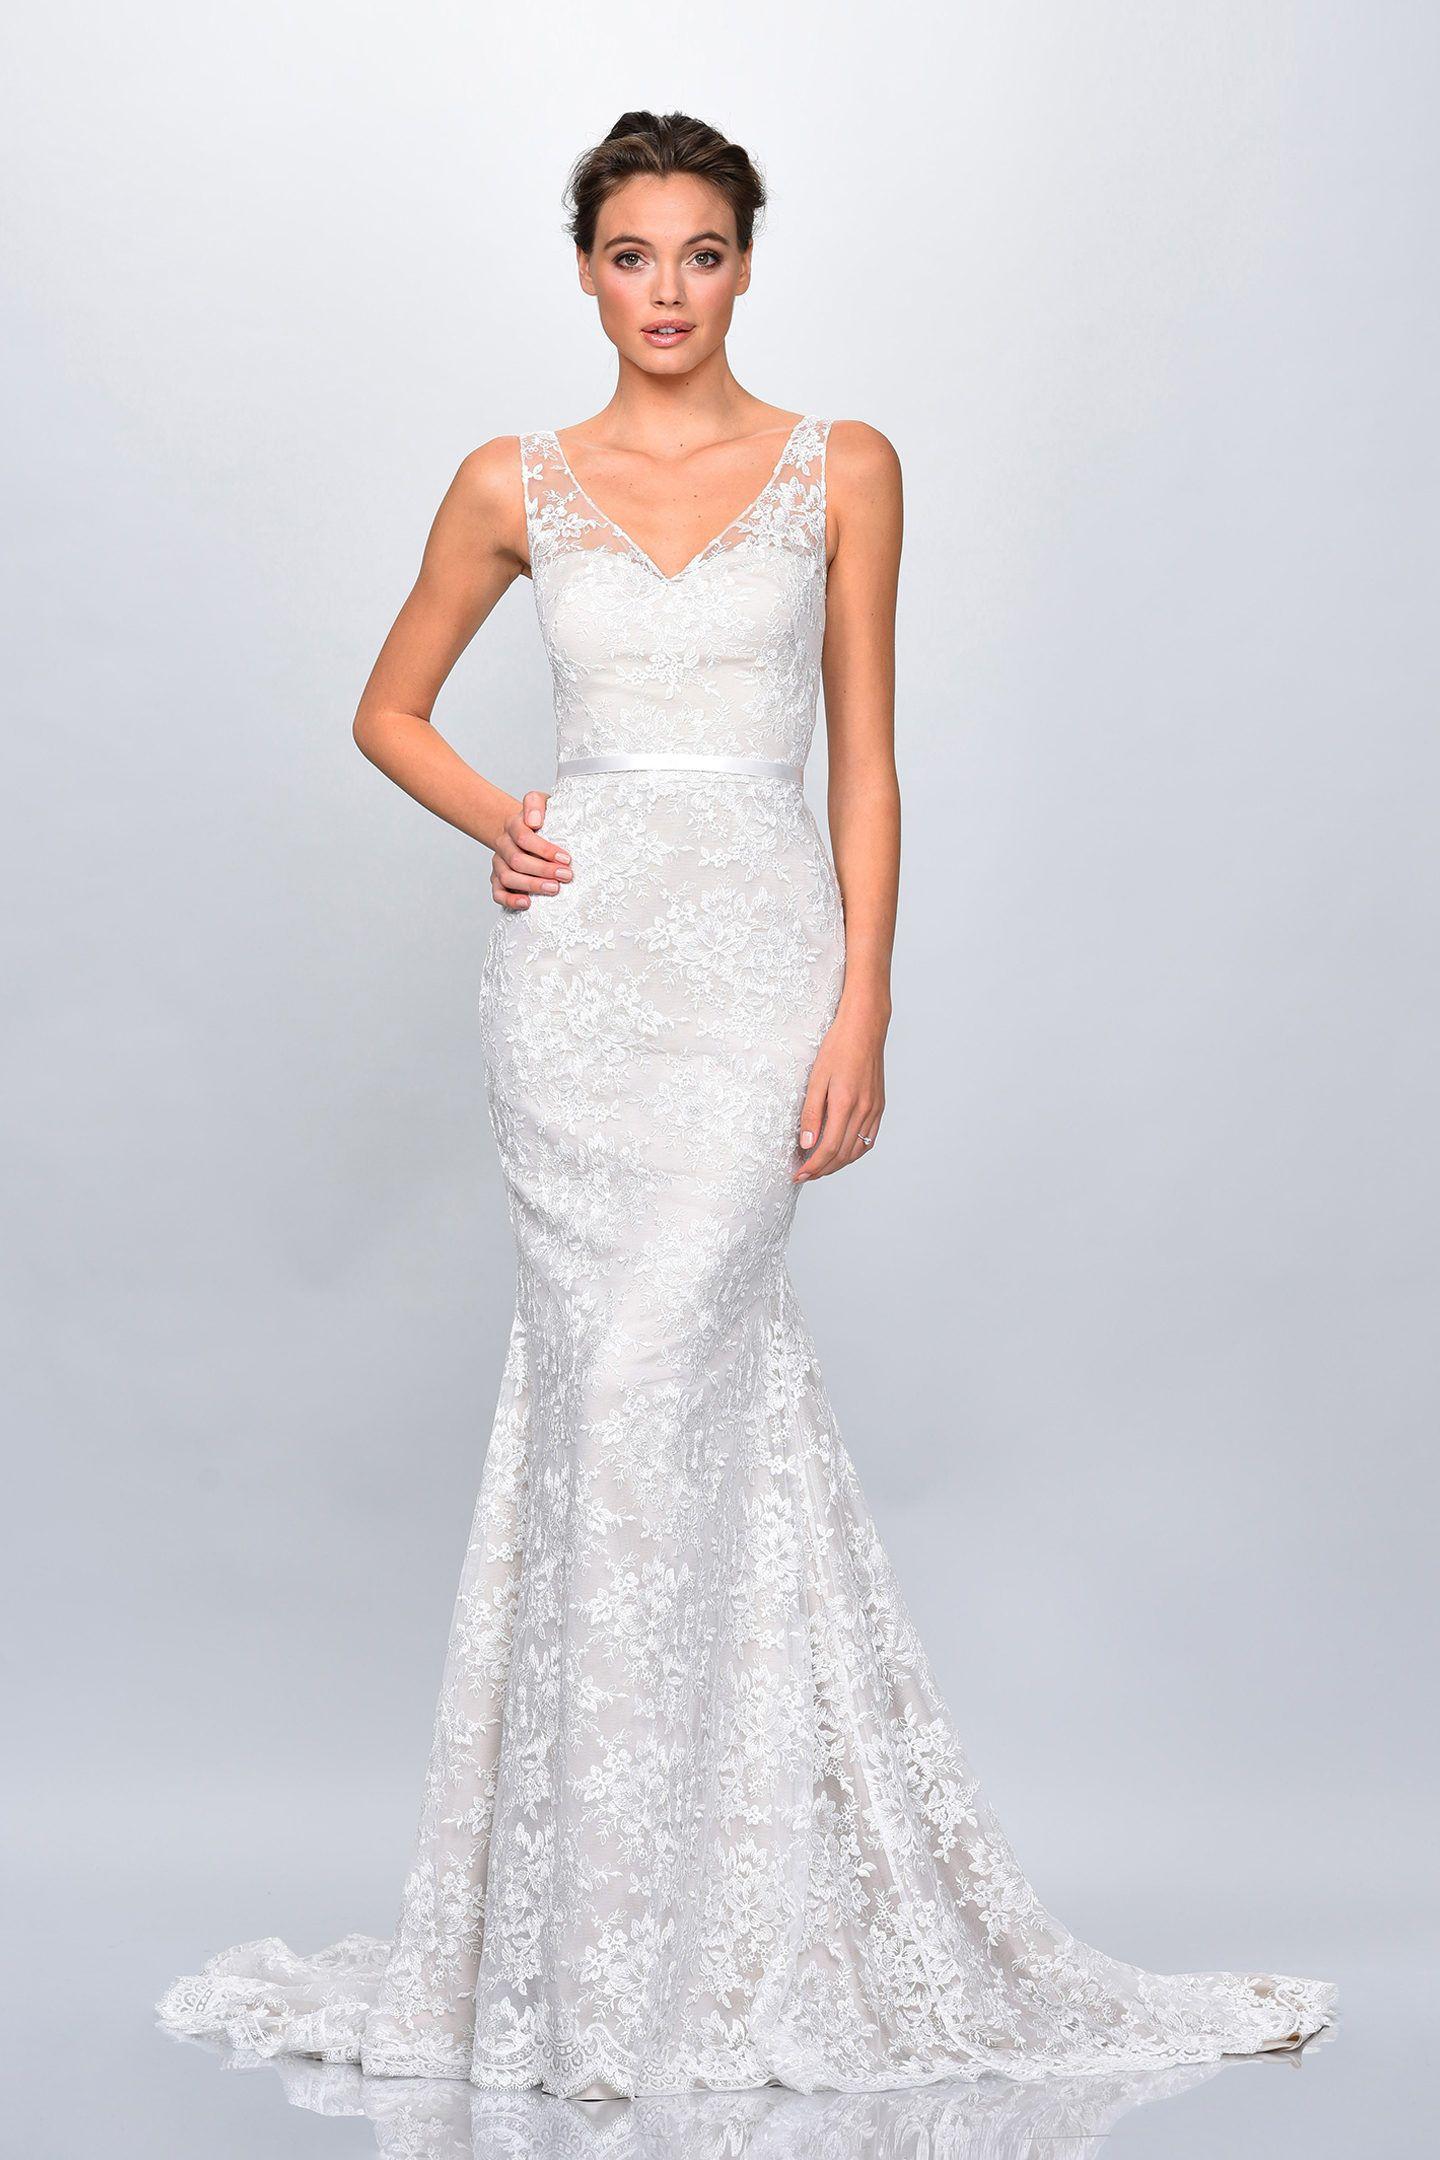 Dahlia Theia Bridal Theia Bridal Wedding Gowns Lace Preloved Wedding Dresses [ 2160 x 1440 Pixel ]